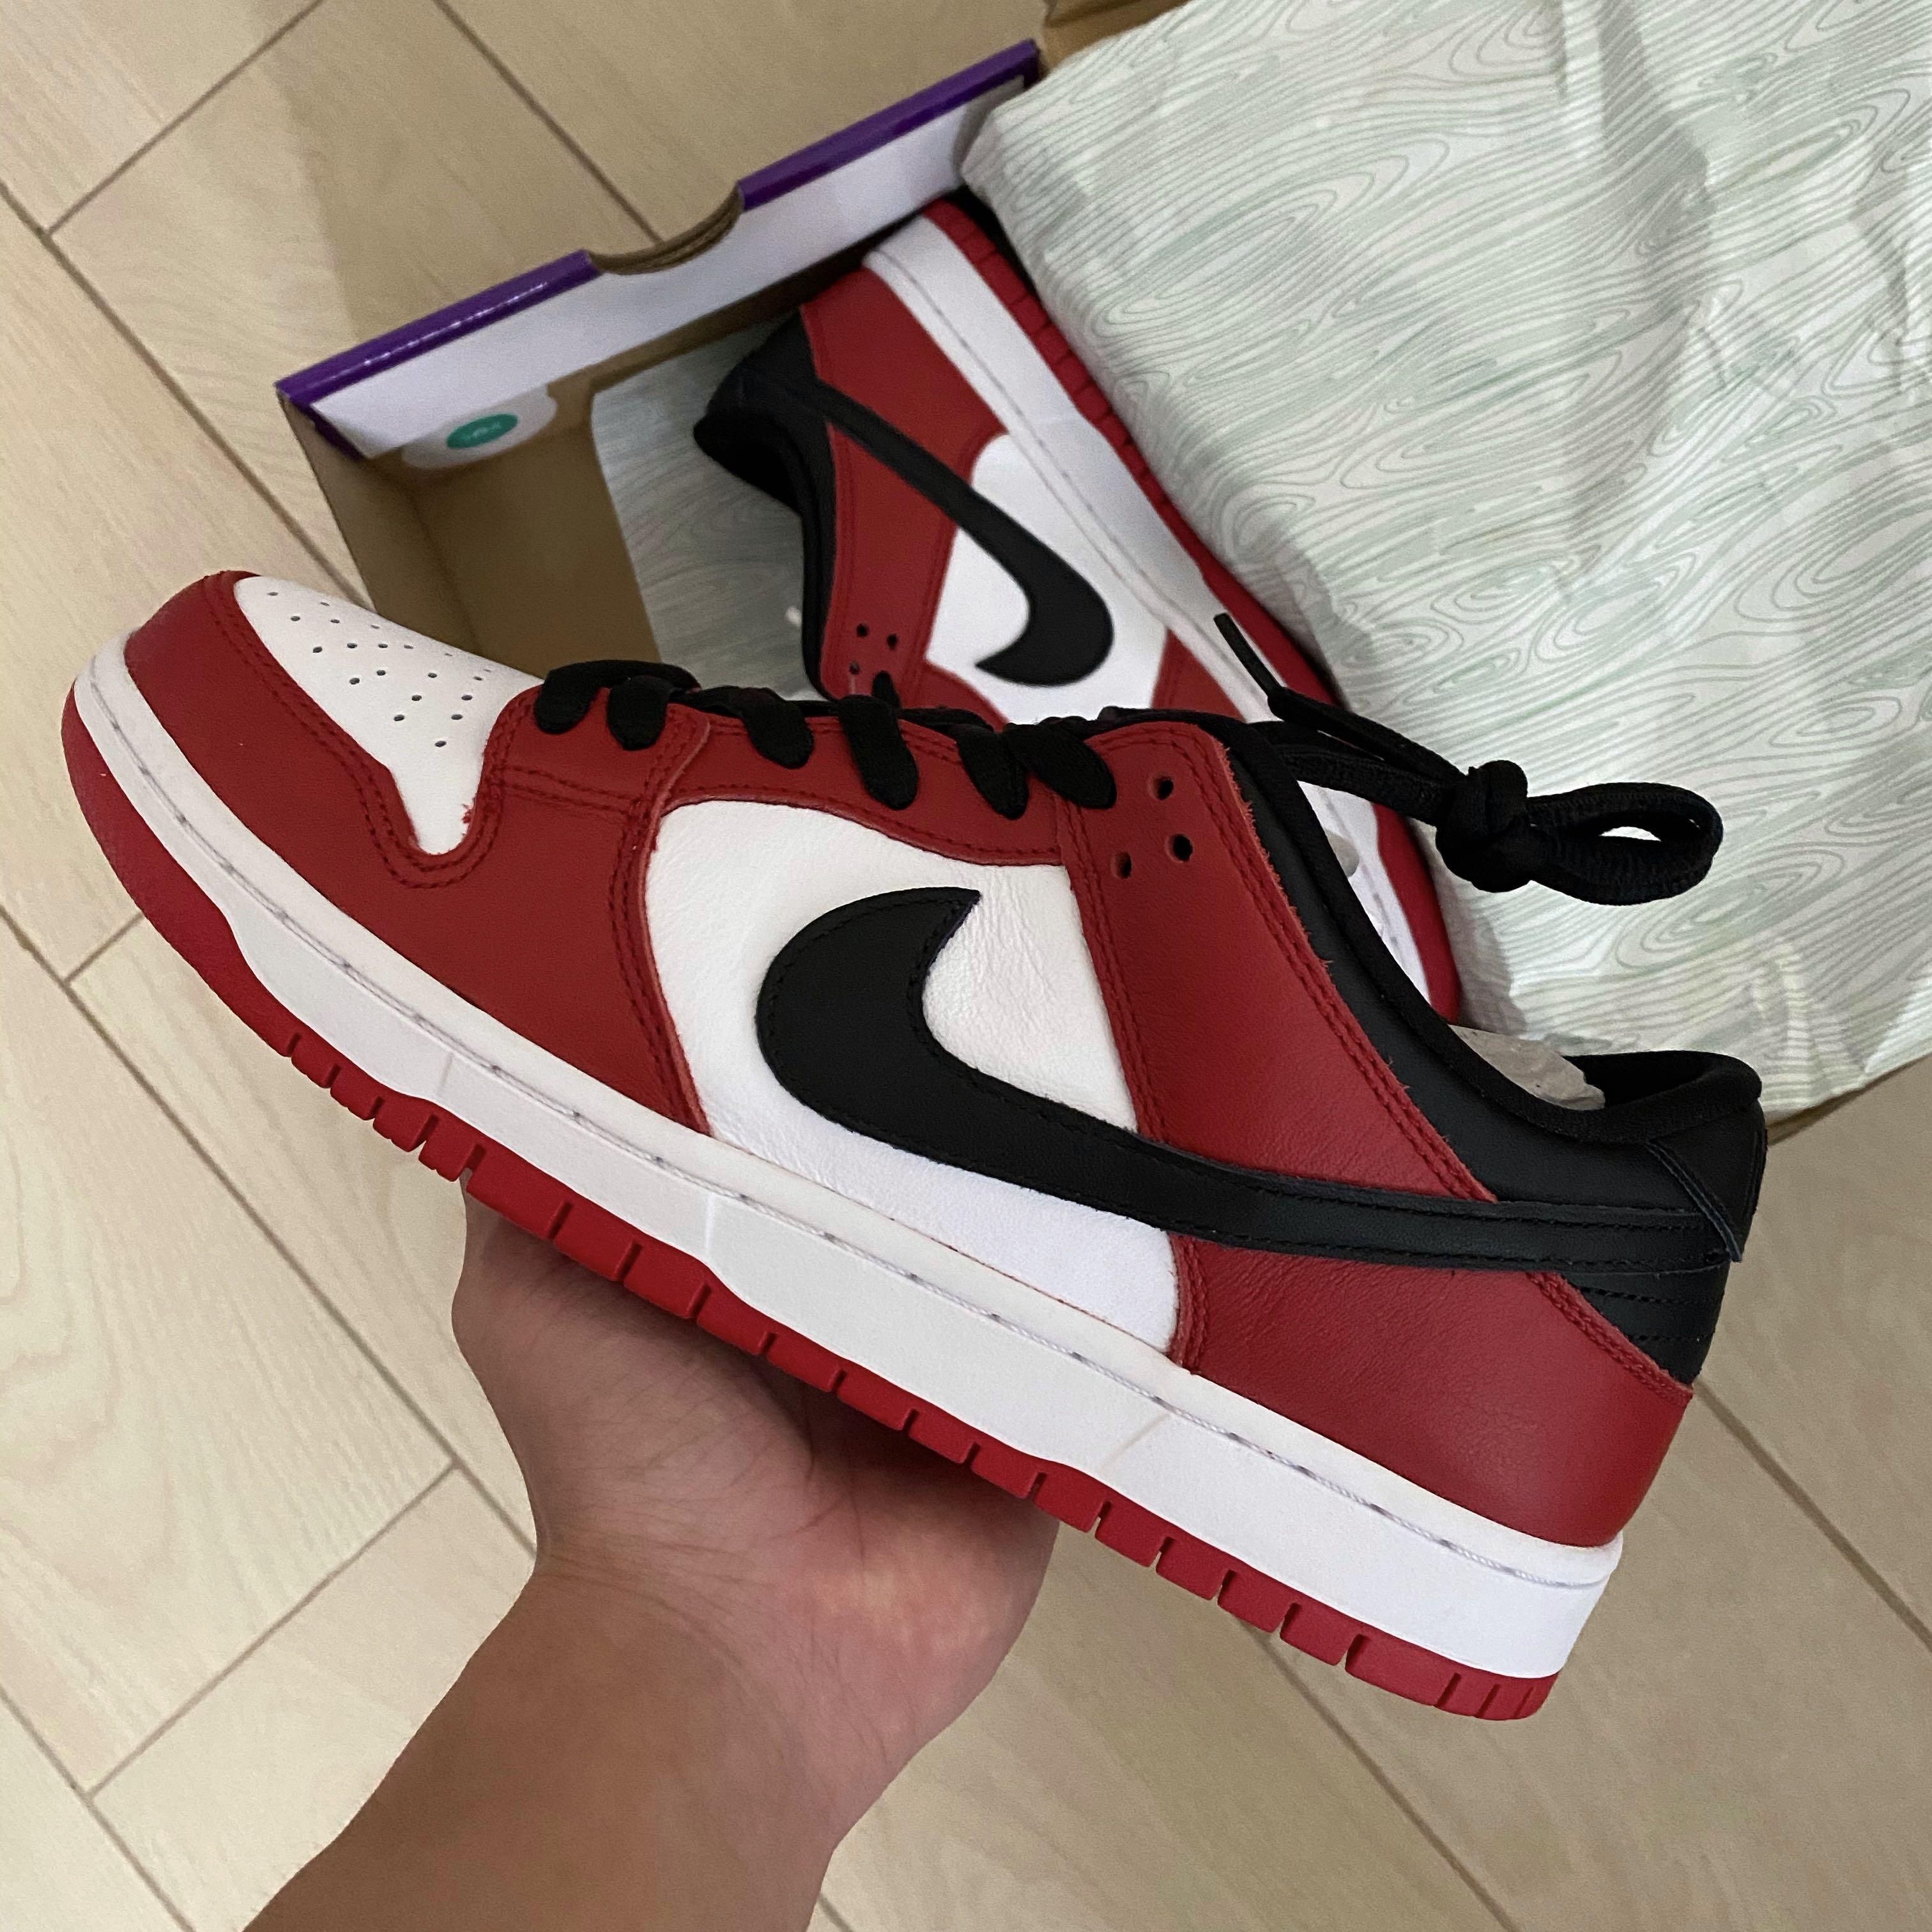 Gran roble sagrado itálico  Nike chicago dunk, Men's Fashion, Footwear, Sneakers on Carousell